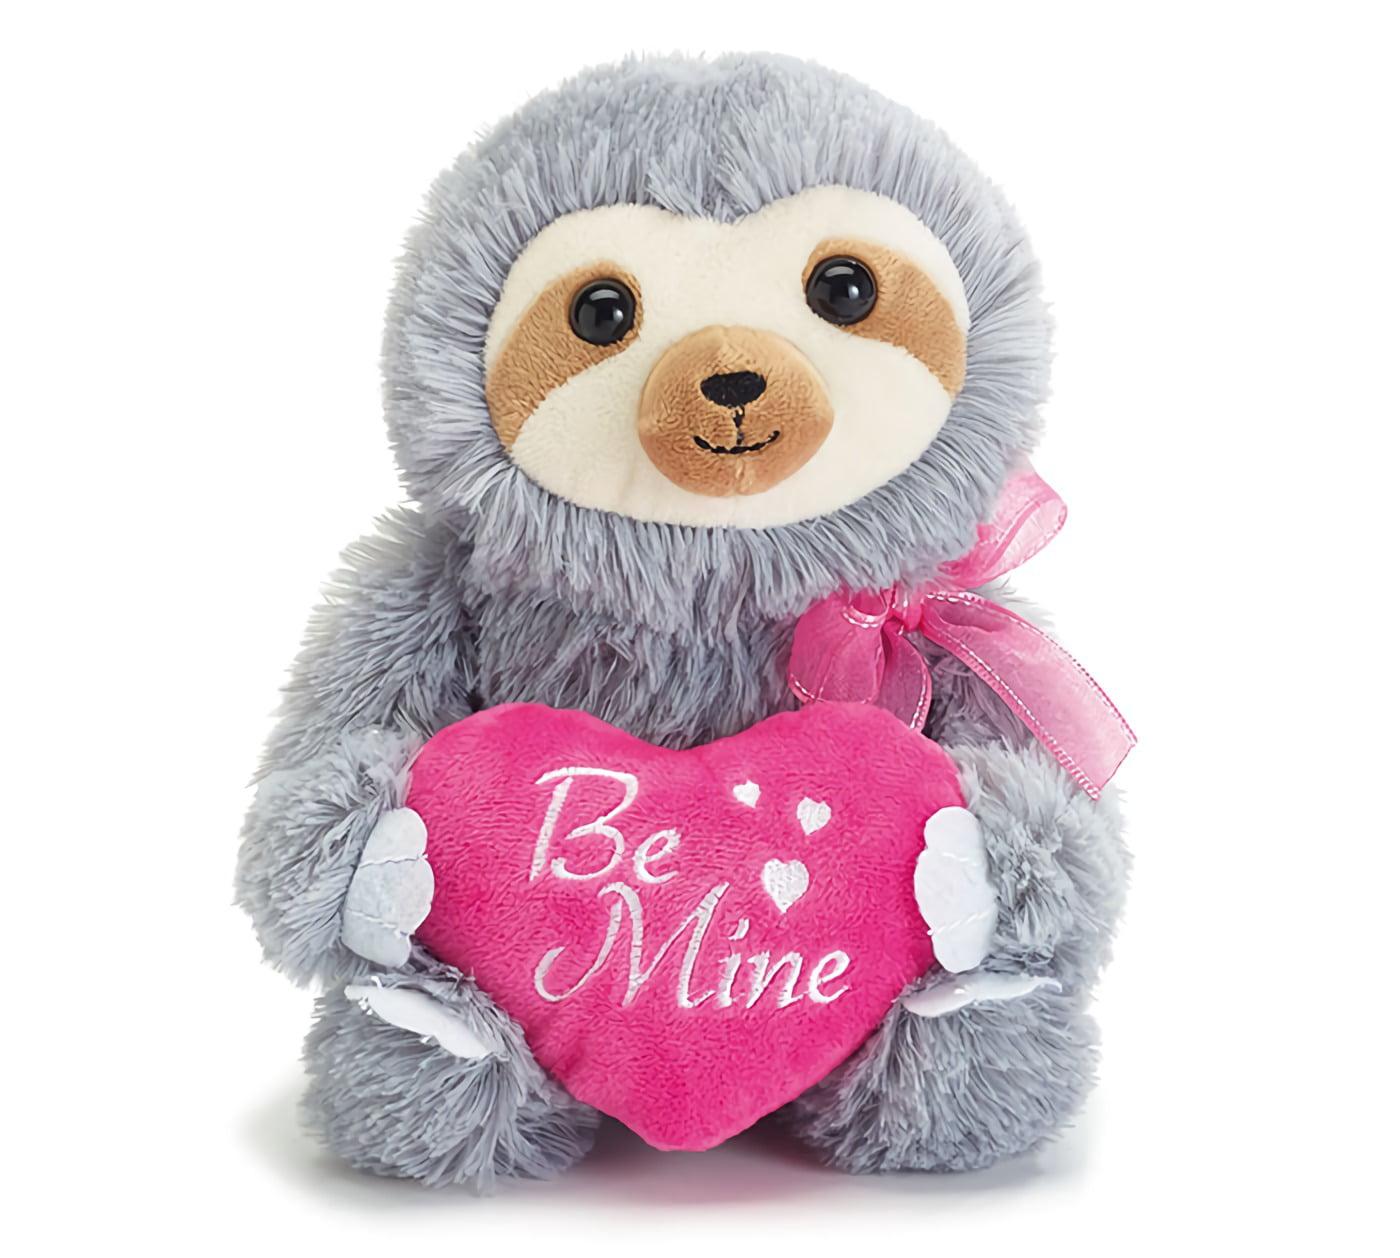 Bee Mine Plush Valentines Day Stuffed Animals